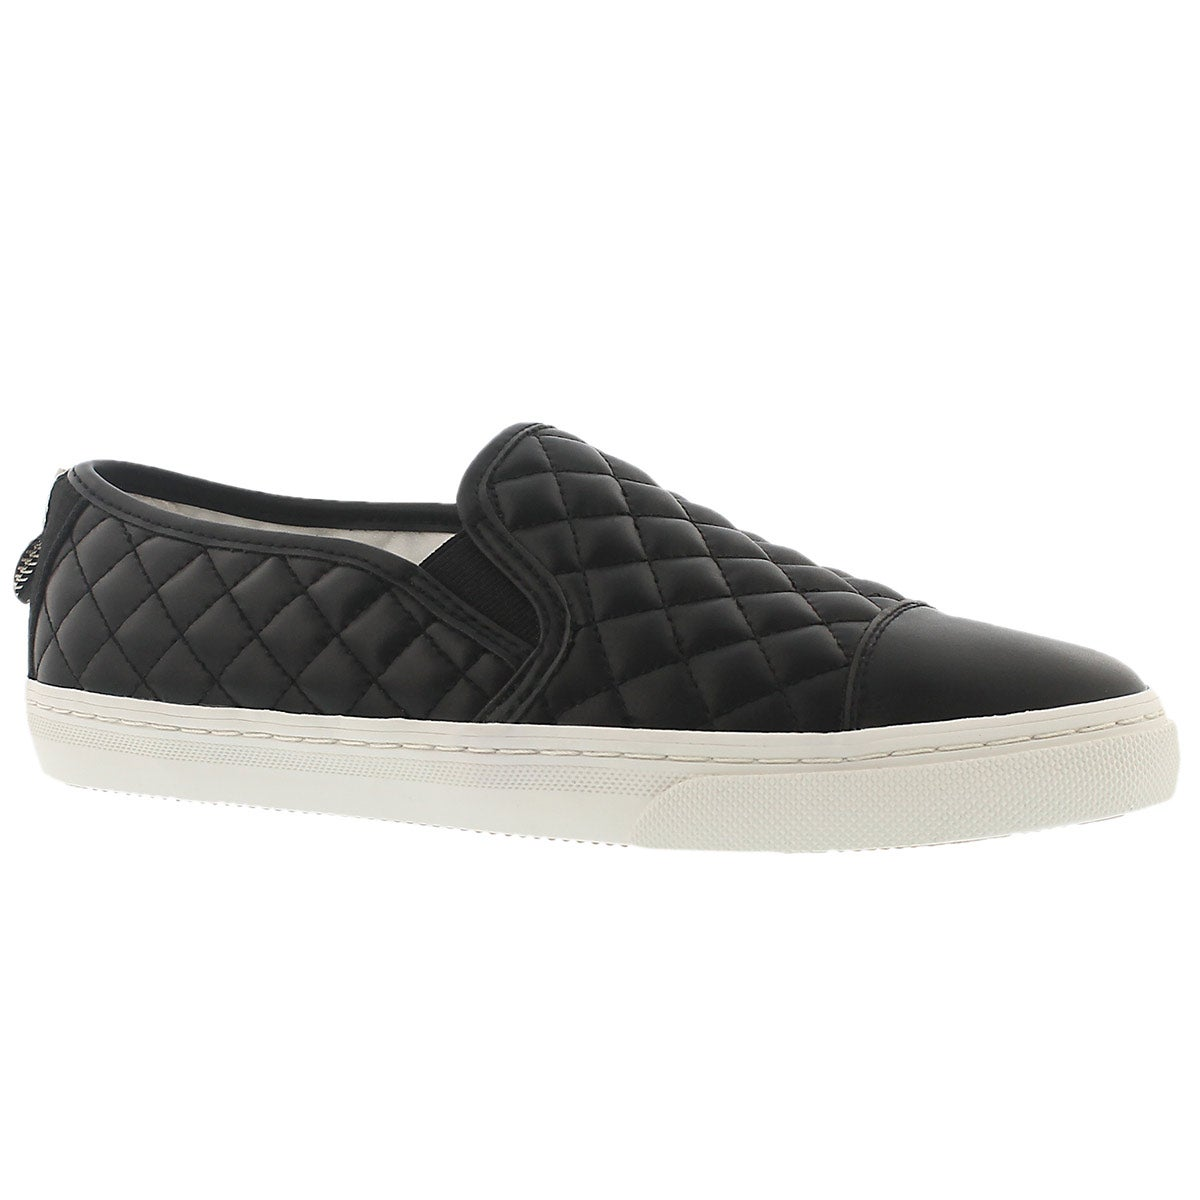 Women's NEW CLUB C black slip-on sneakers